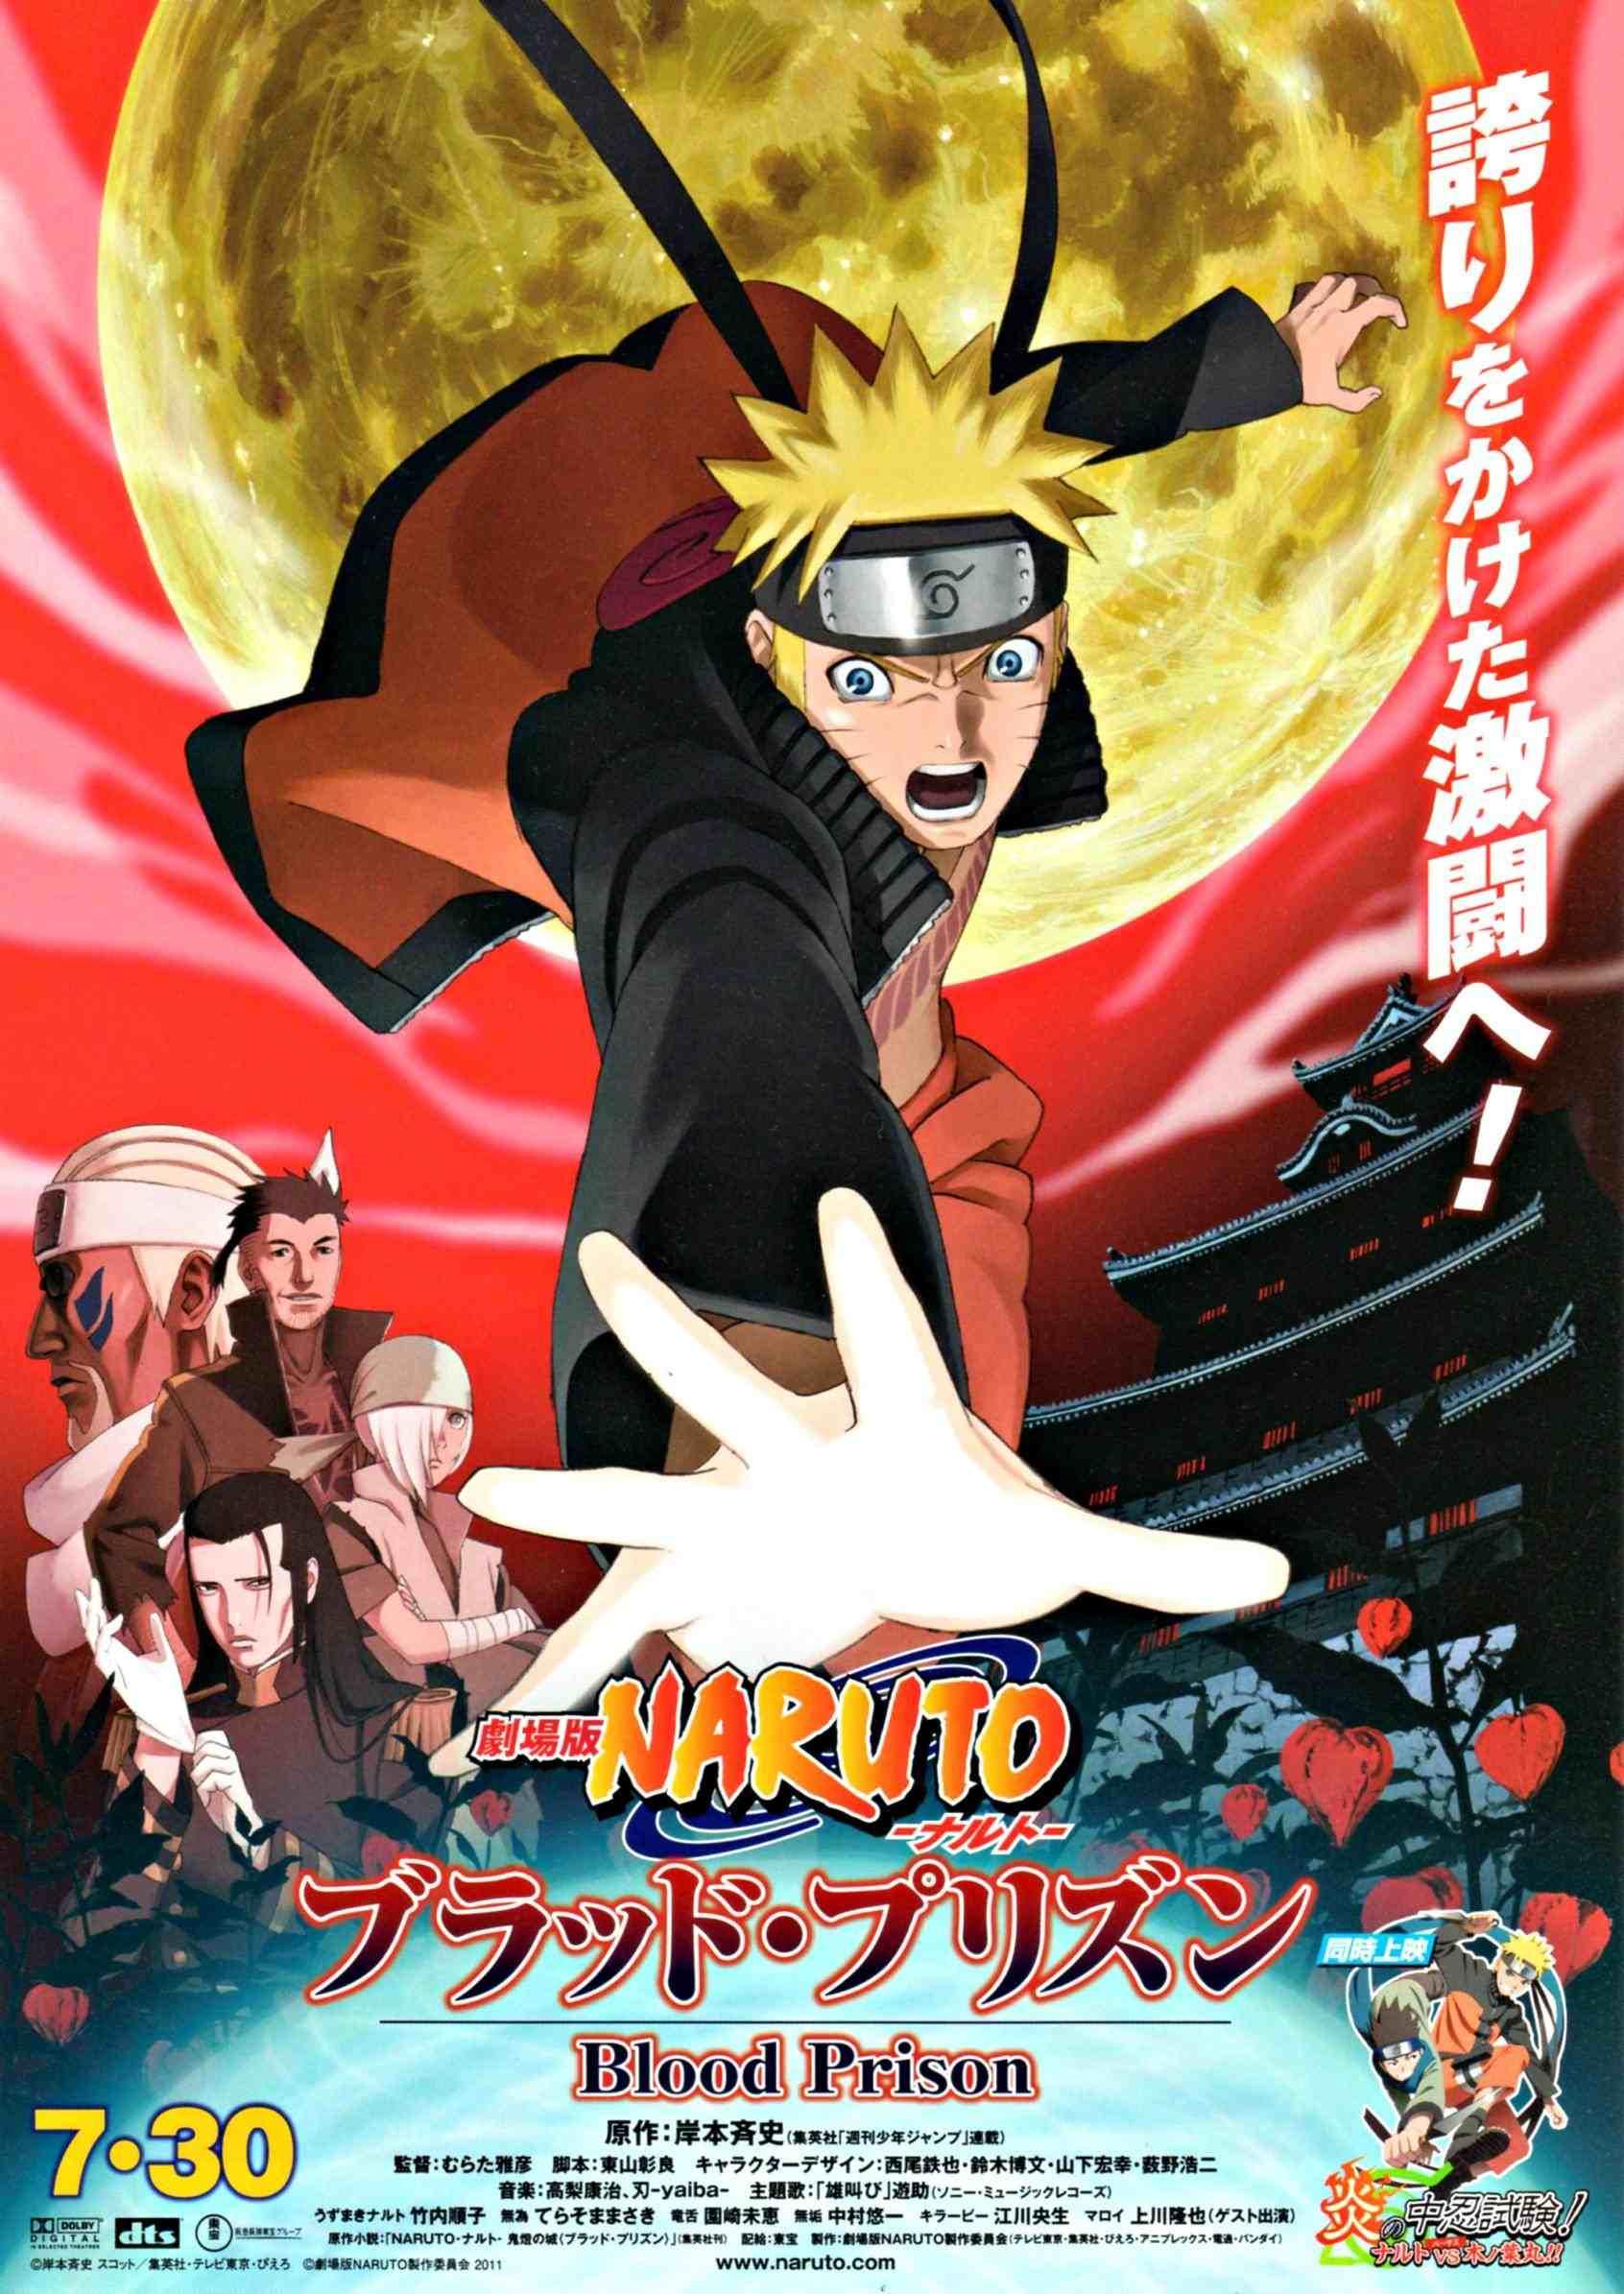 anime naruto movie: Naruto The Movie: Blood Prison